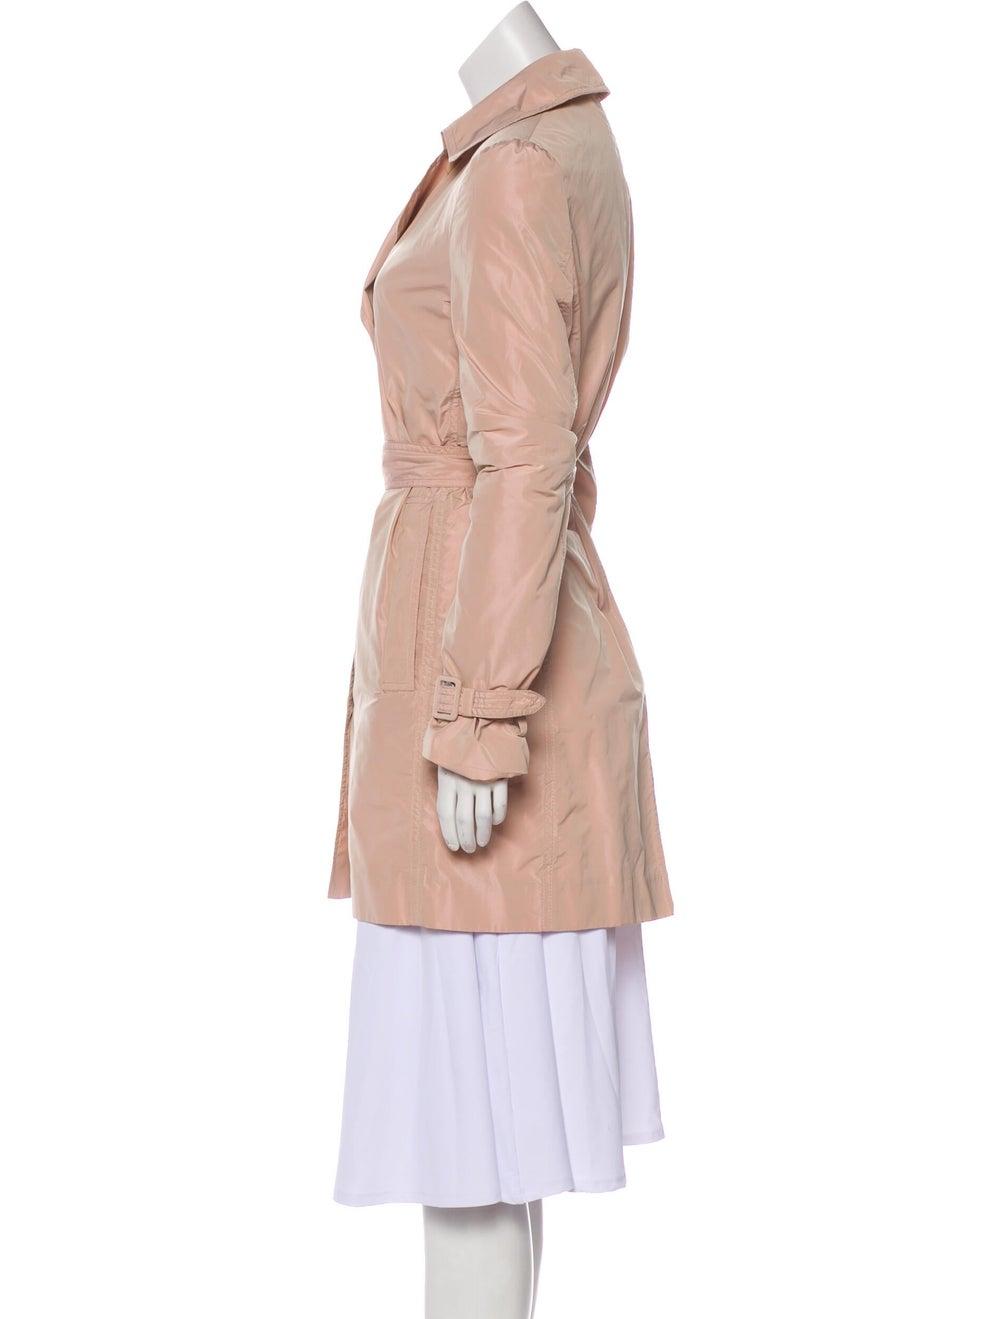 Stella McCartney Trench Coat Pink - image 2